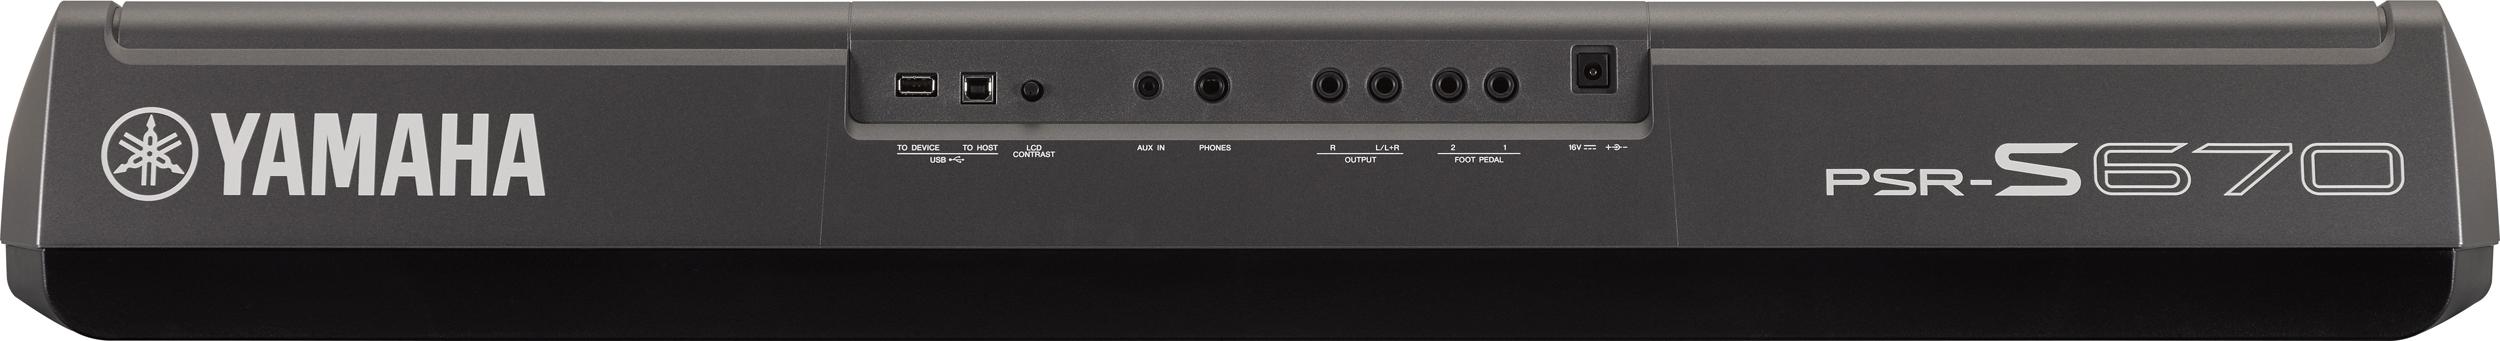 PSR-S670 Arranger Workstation Keyboard Featuring 128note Polyphony &  Megavoice Technology